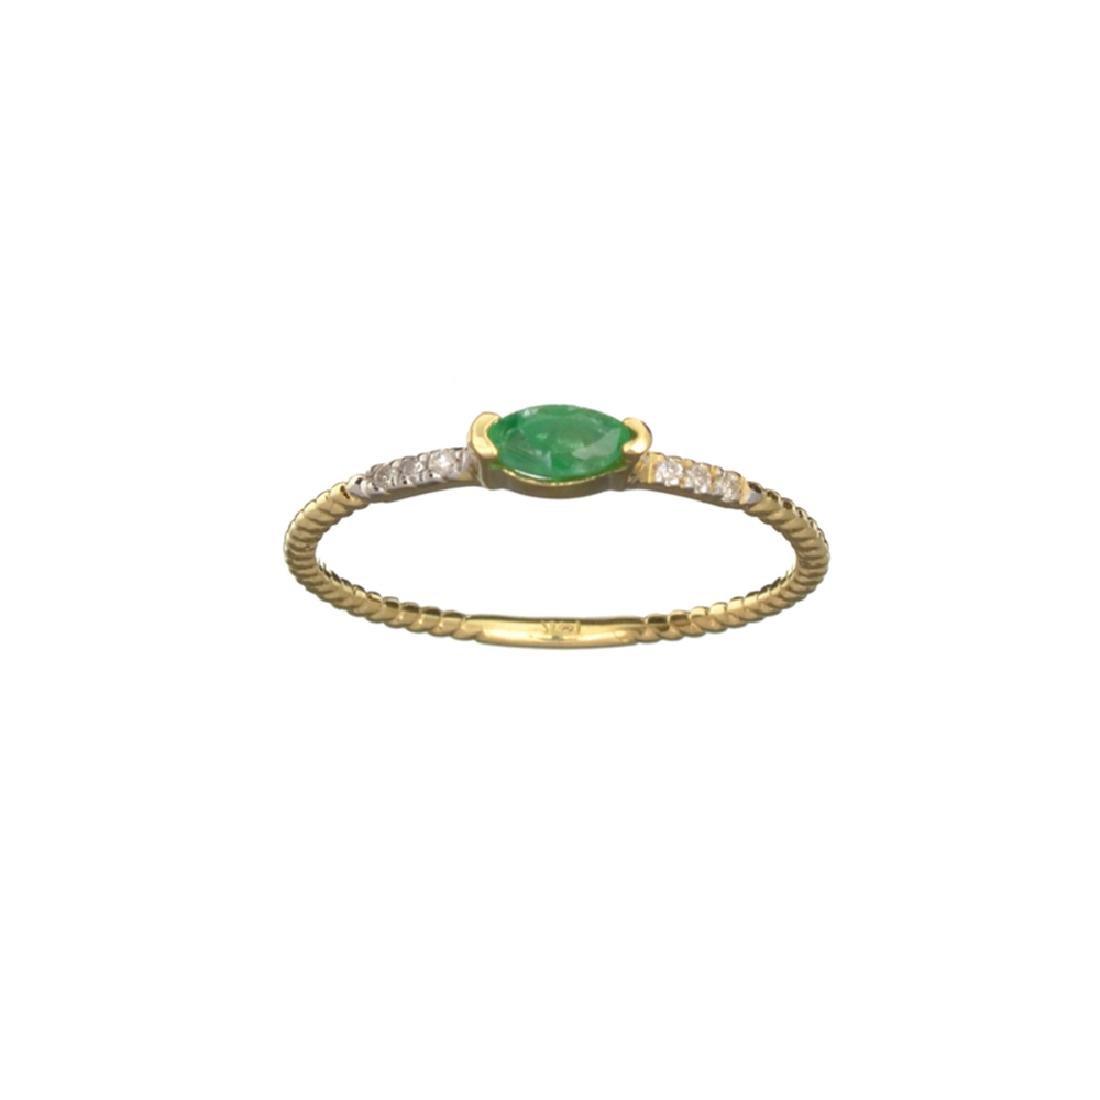 APP: 0.4k Fine Jewelry 14KT Gold, 0.14CT Green Emerald